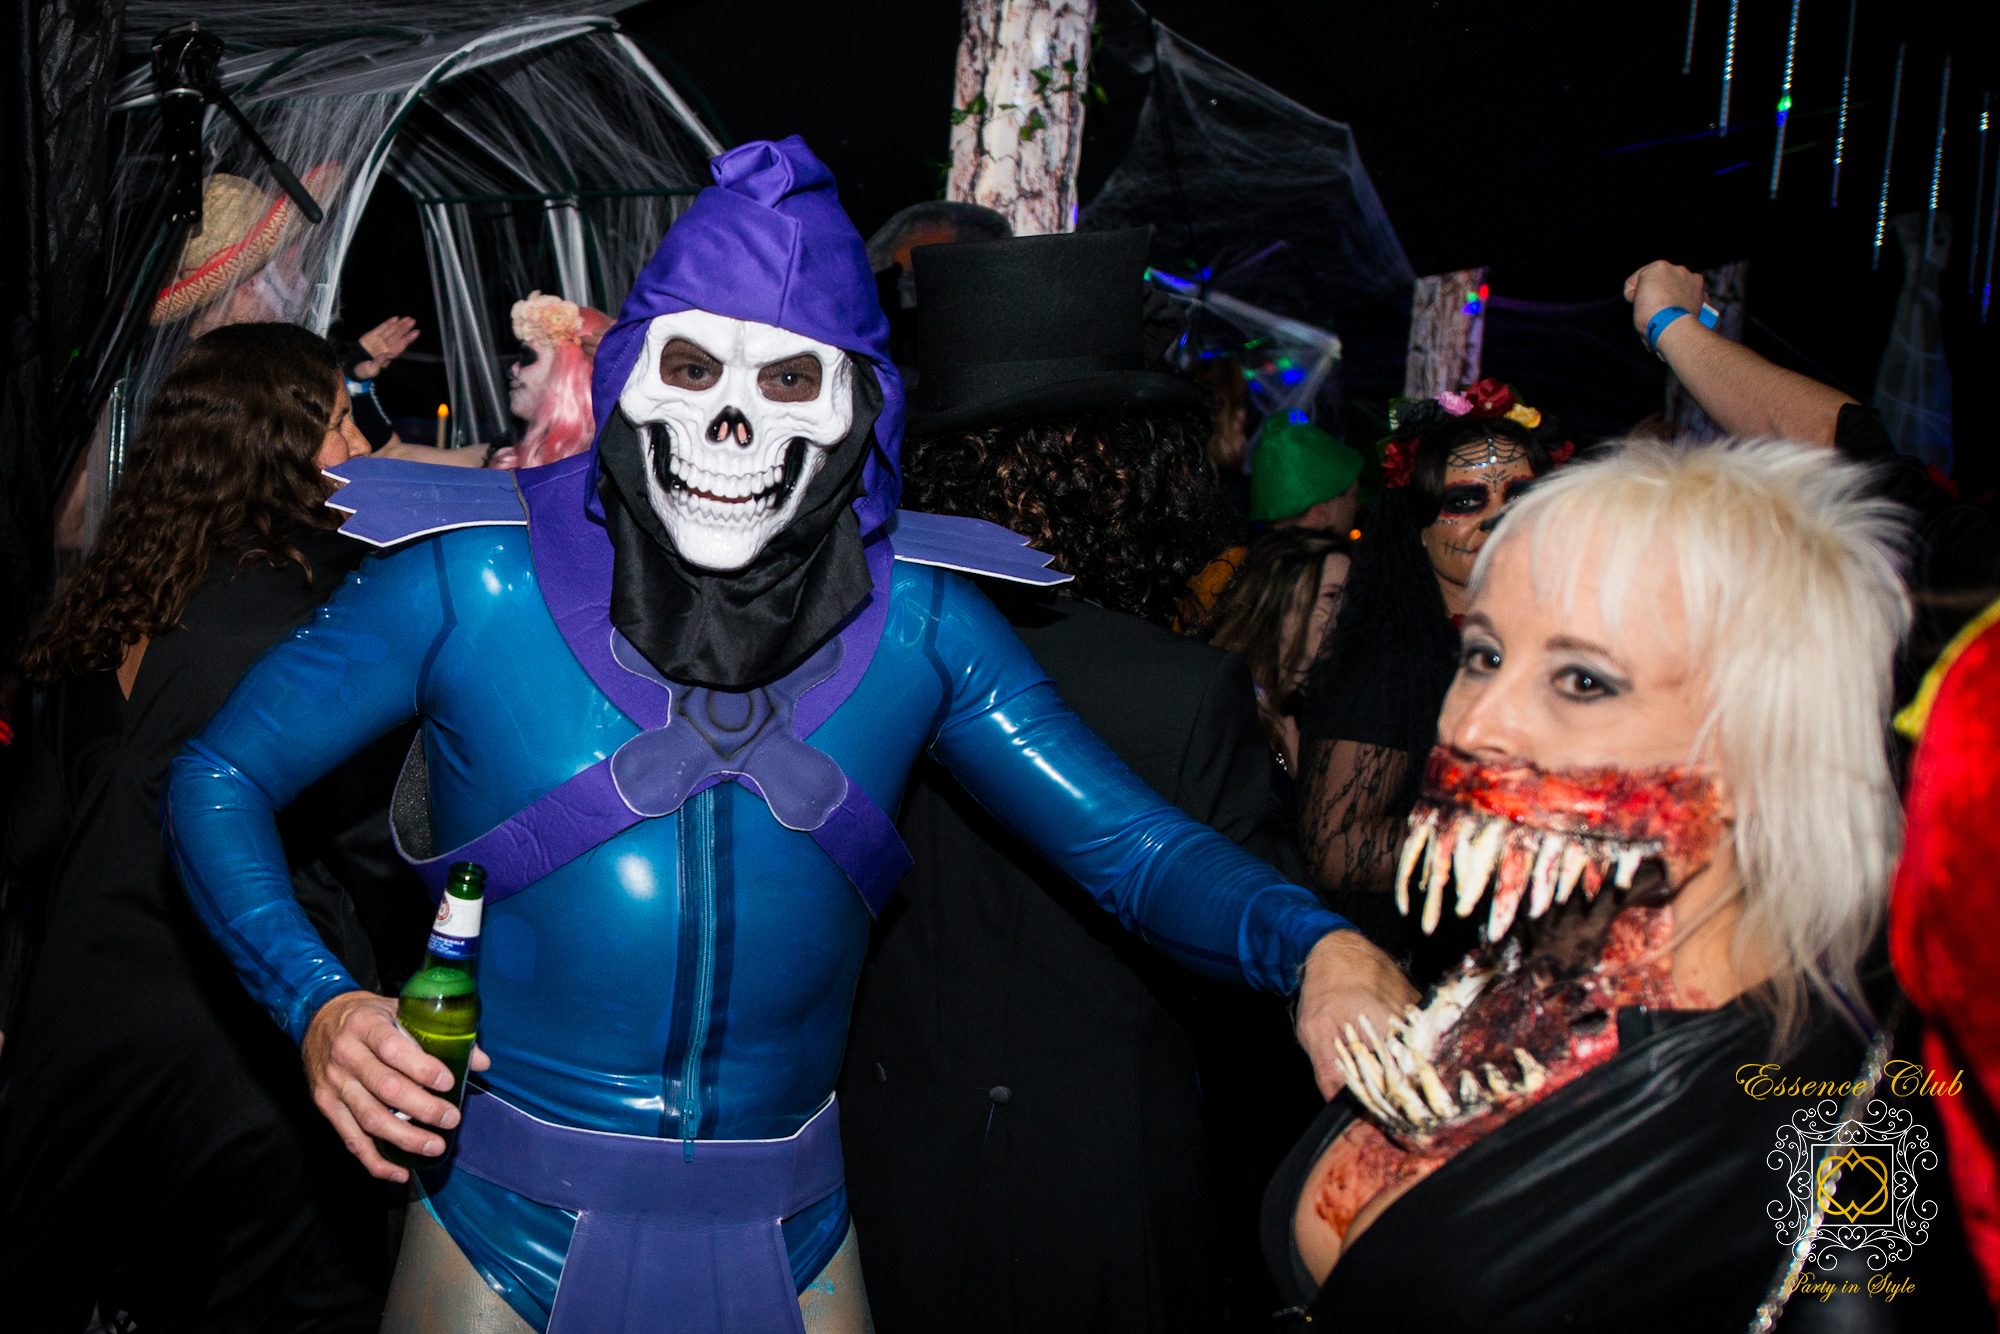 Halloween party dress